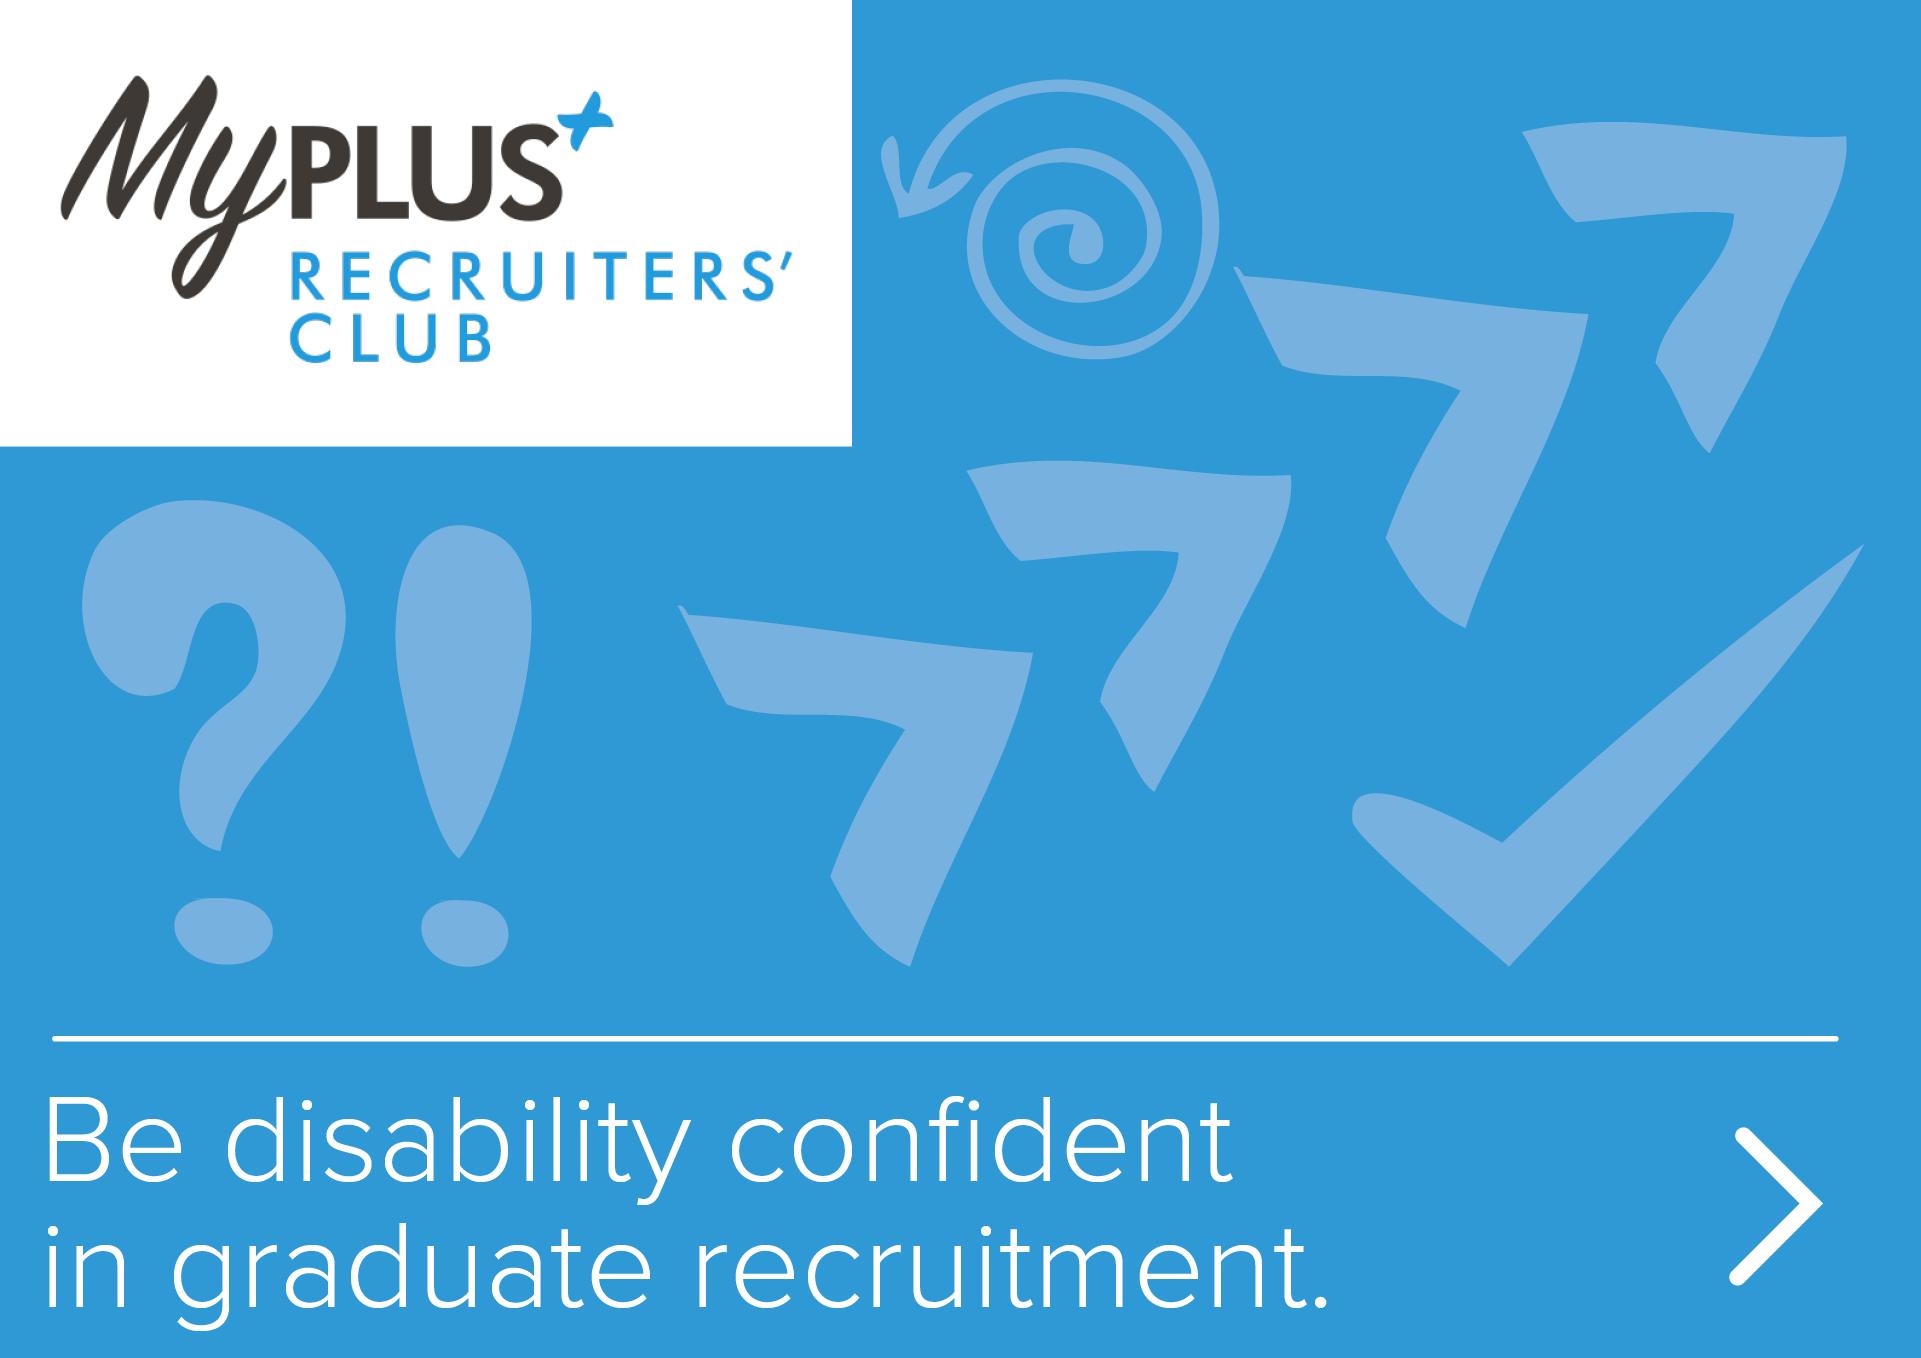 Be disability confident in graduate recruitment.